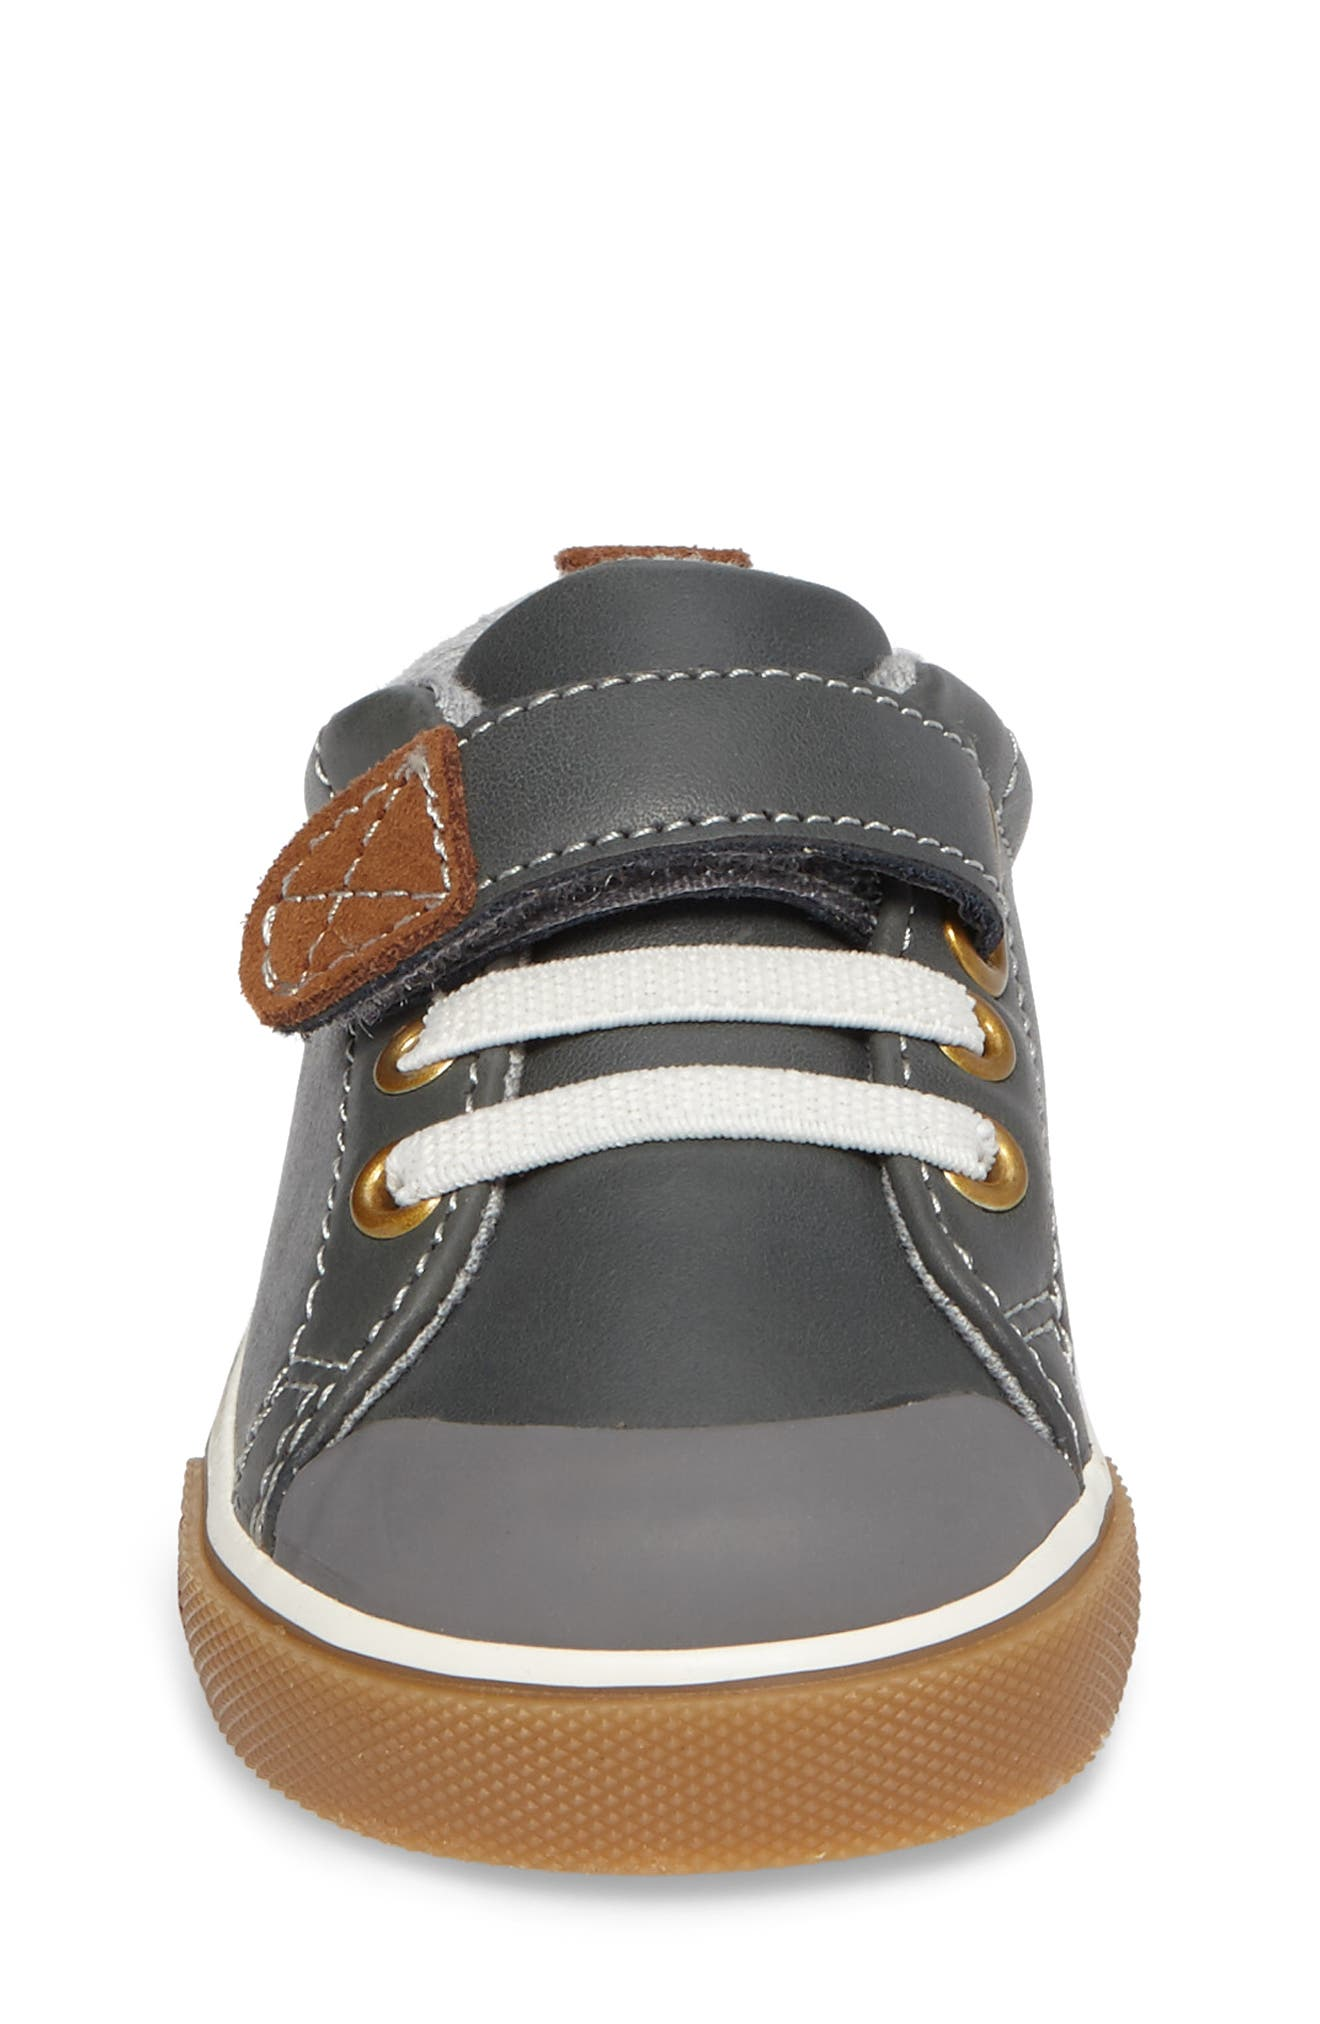 SEE KAI RUN, Stevie II Sneaker, Alternate thumbnail 4, color, GREY LEATHER